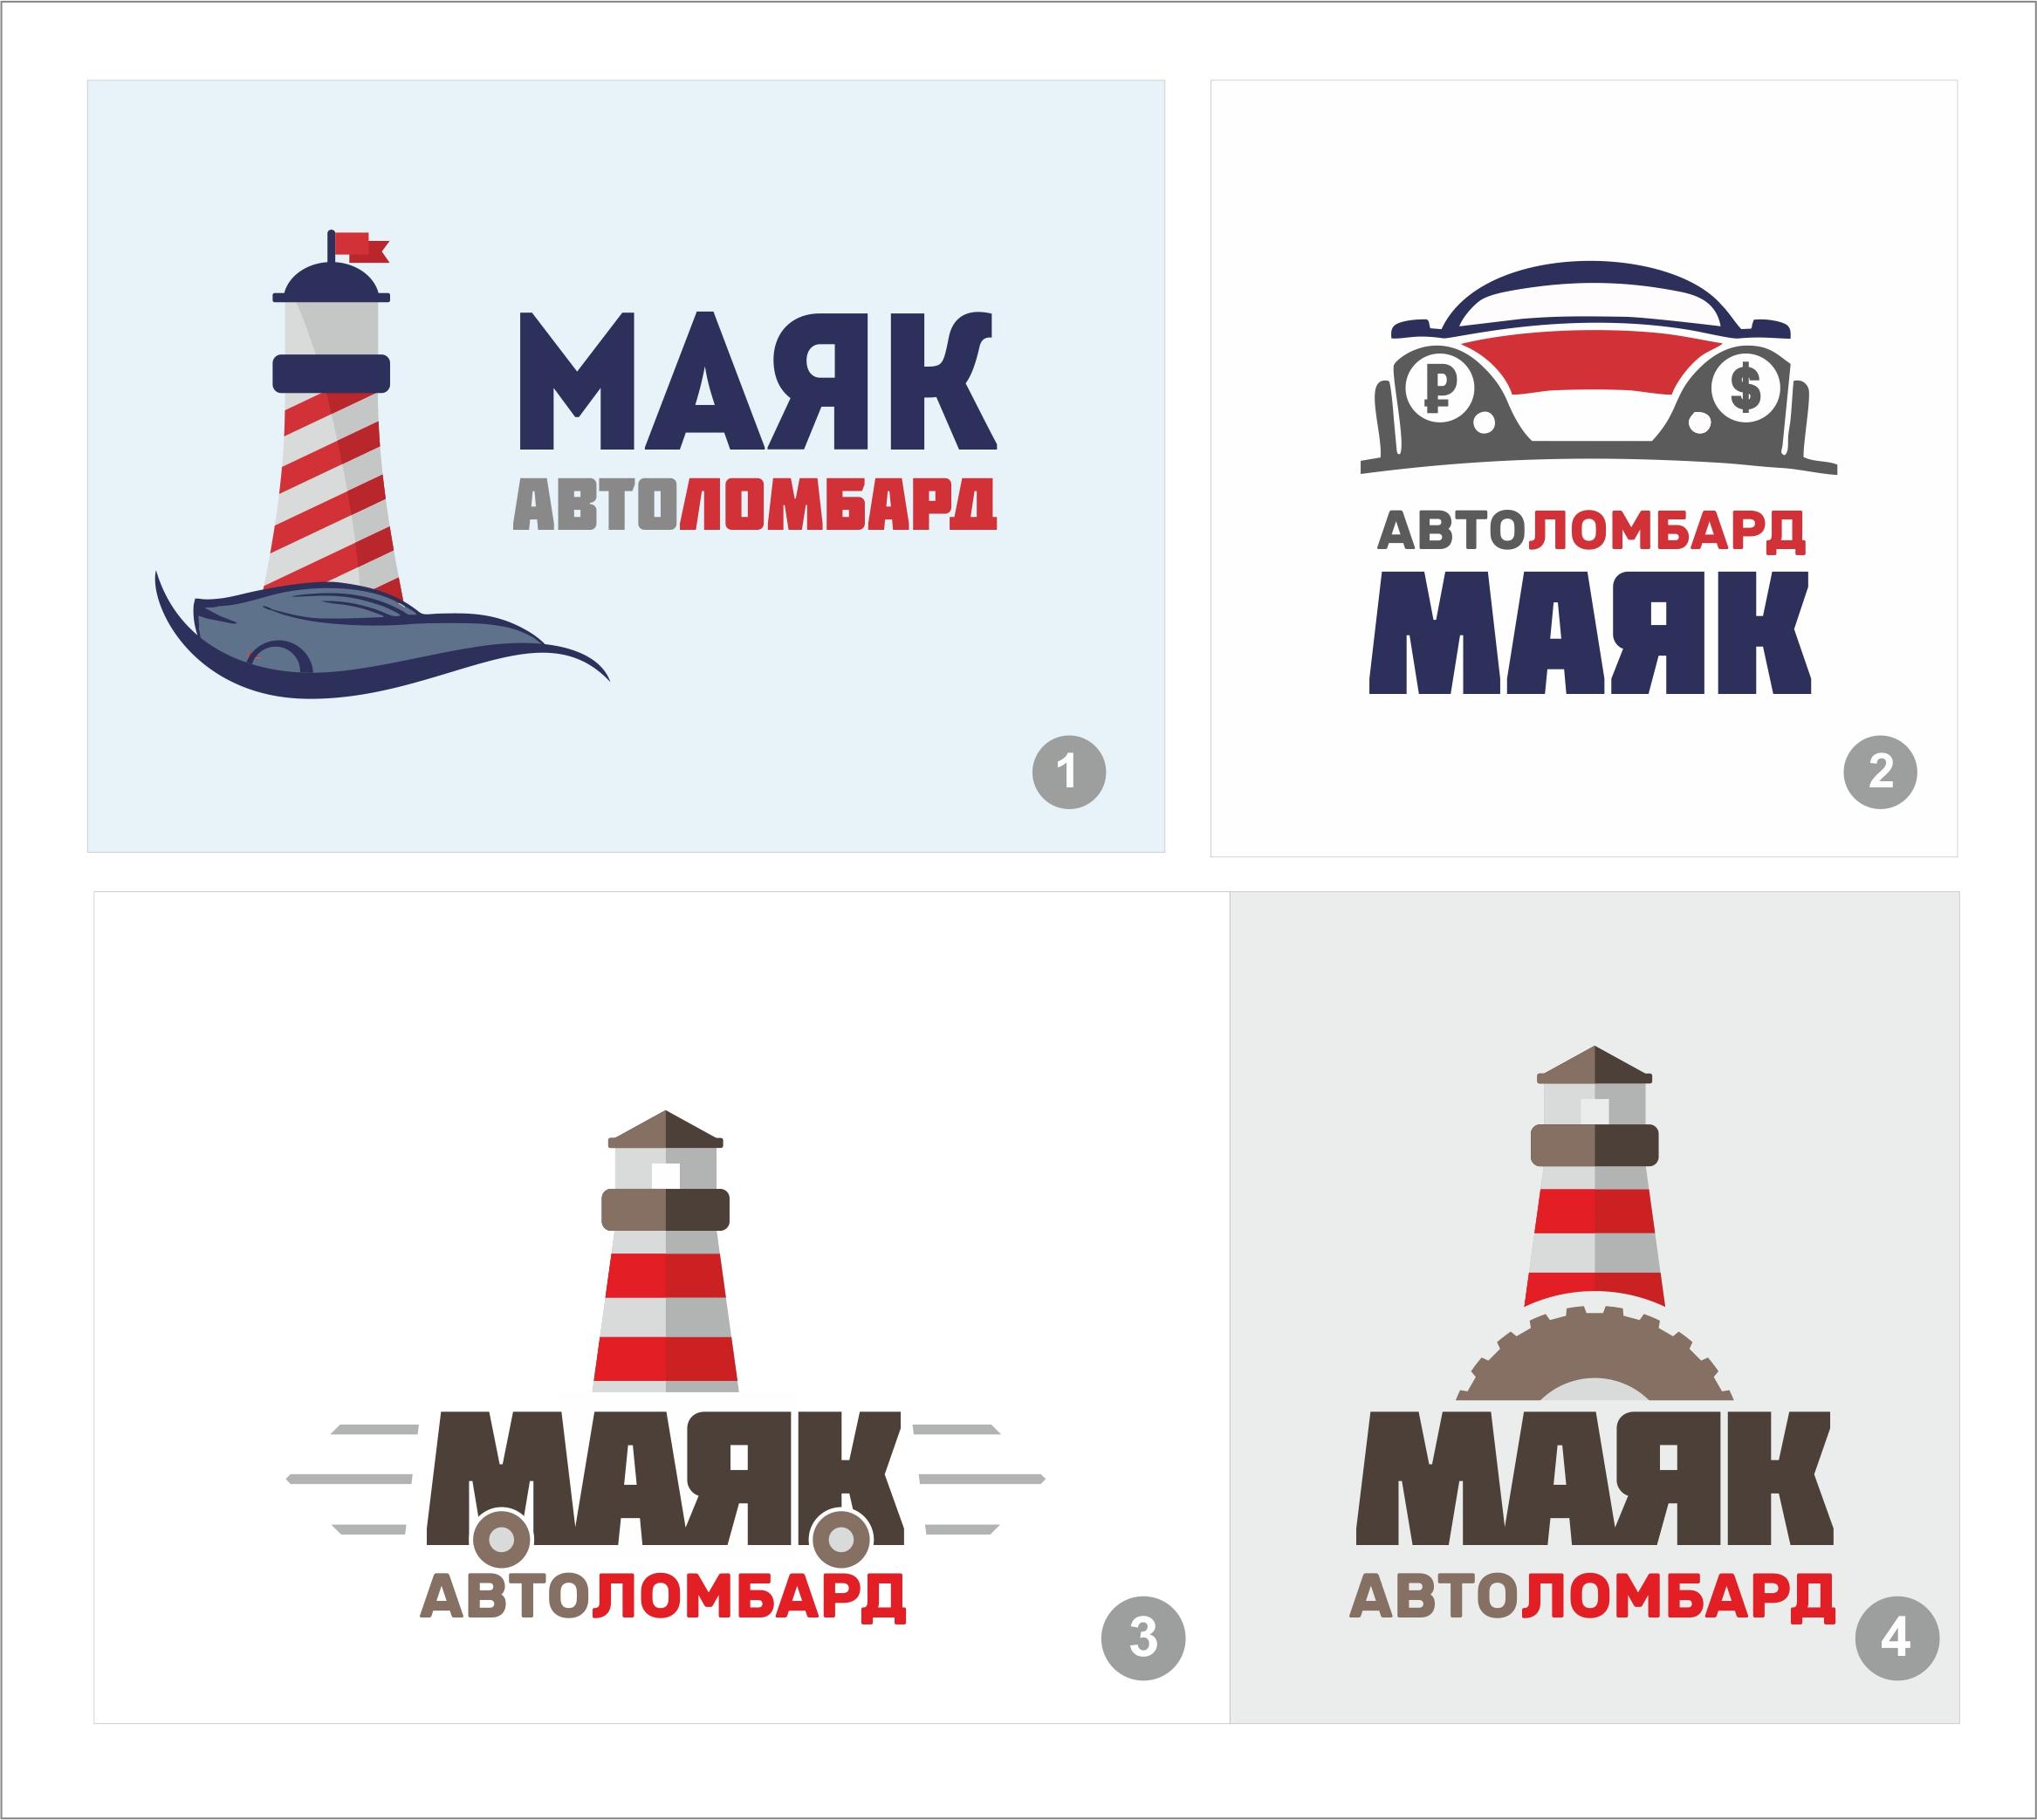 Разработать логотип и дизайн визитки  фото f_0525b685743663bd.jpg